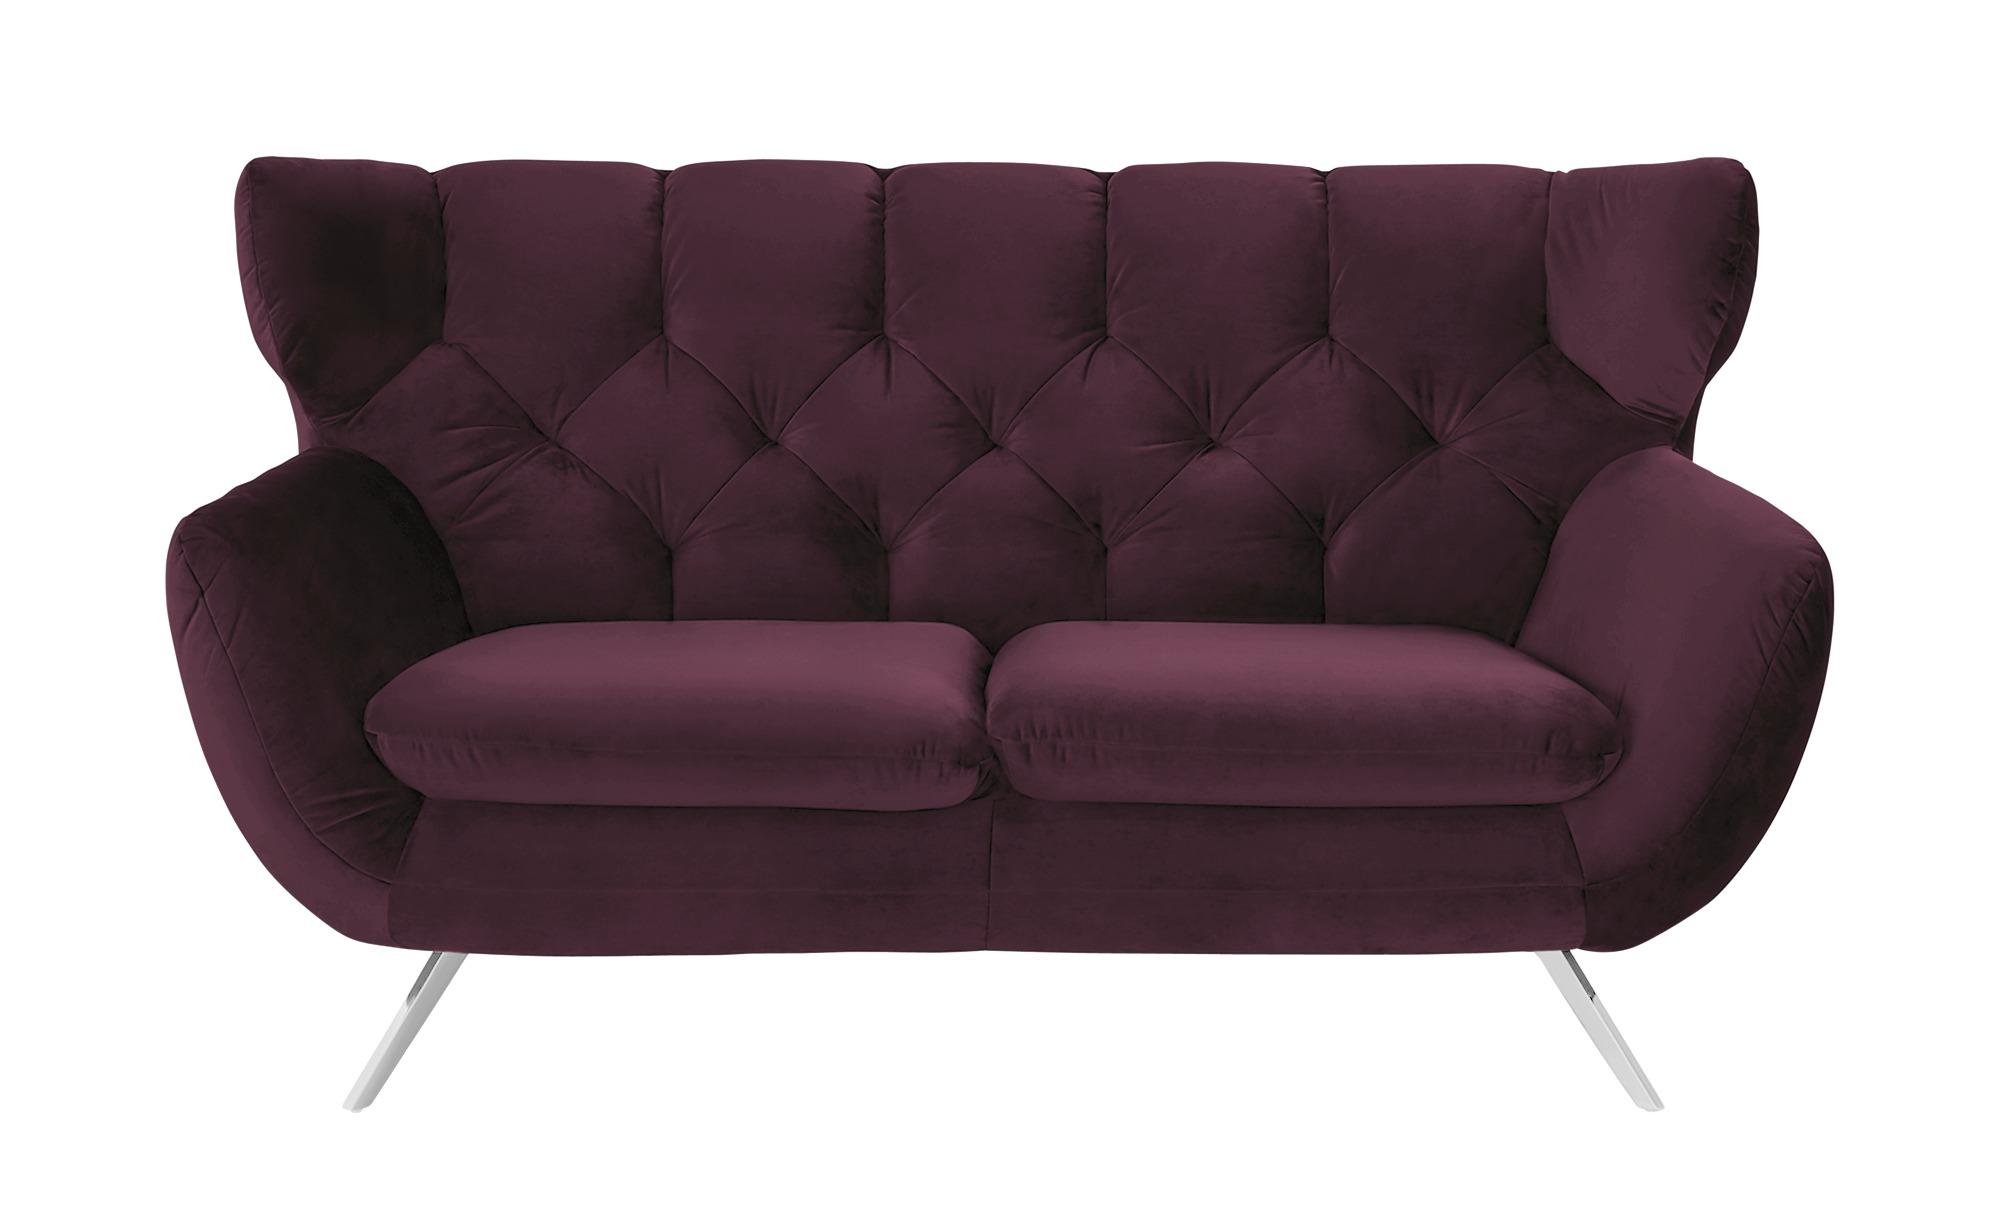 pop Sofa  Caldara ¦ lila/violett ¦ Maße (cm): B: 175 H: 94 T: 95 Polstermöbel > Sofas > 2-Sitzer - Höffner